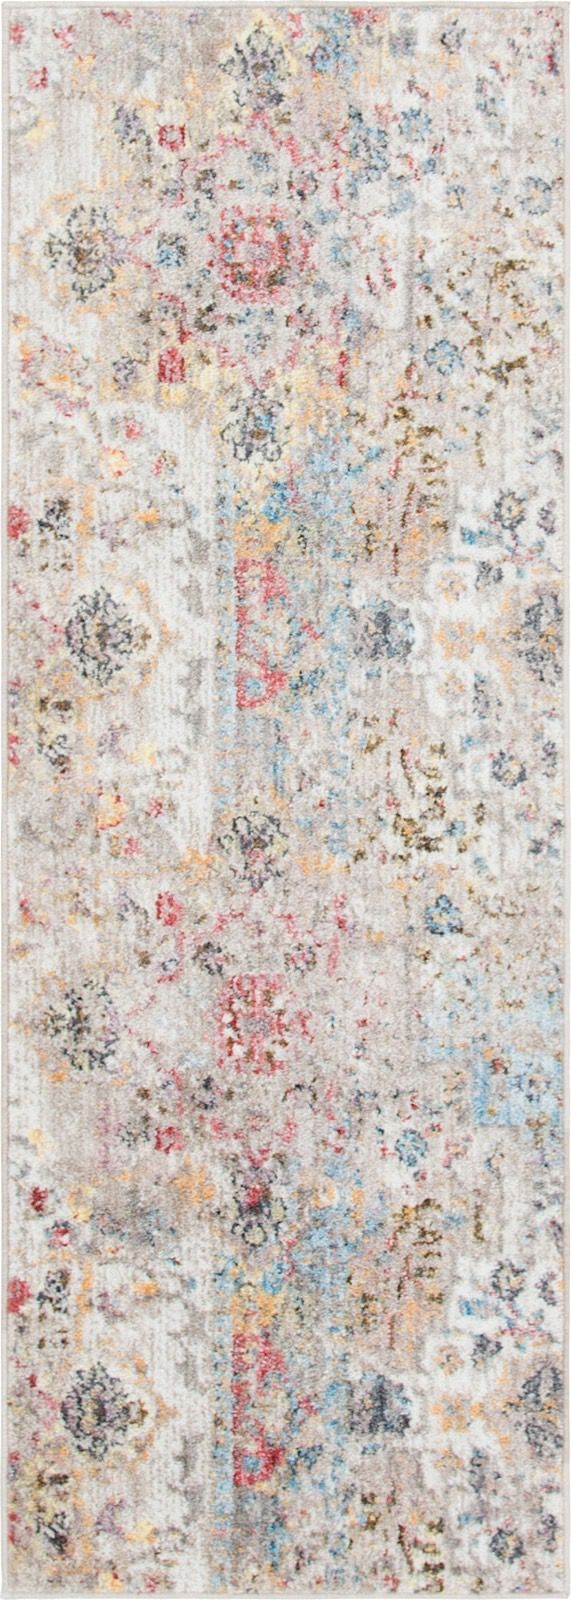 boheme southwestern/lodge area rug collection